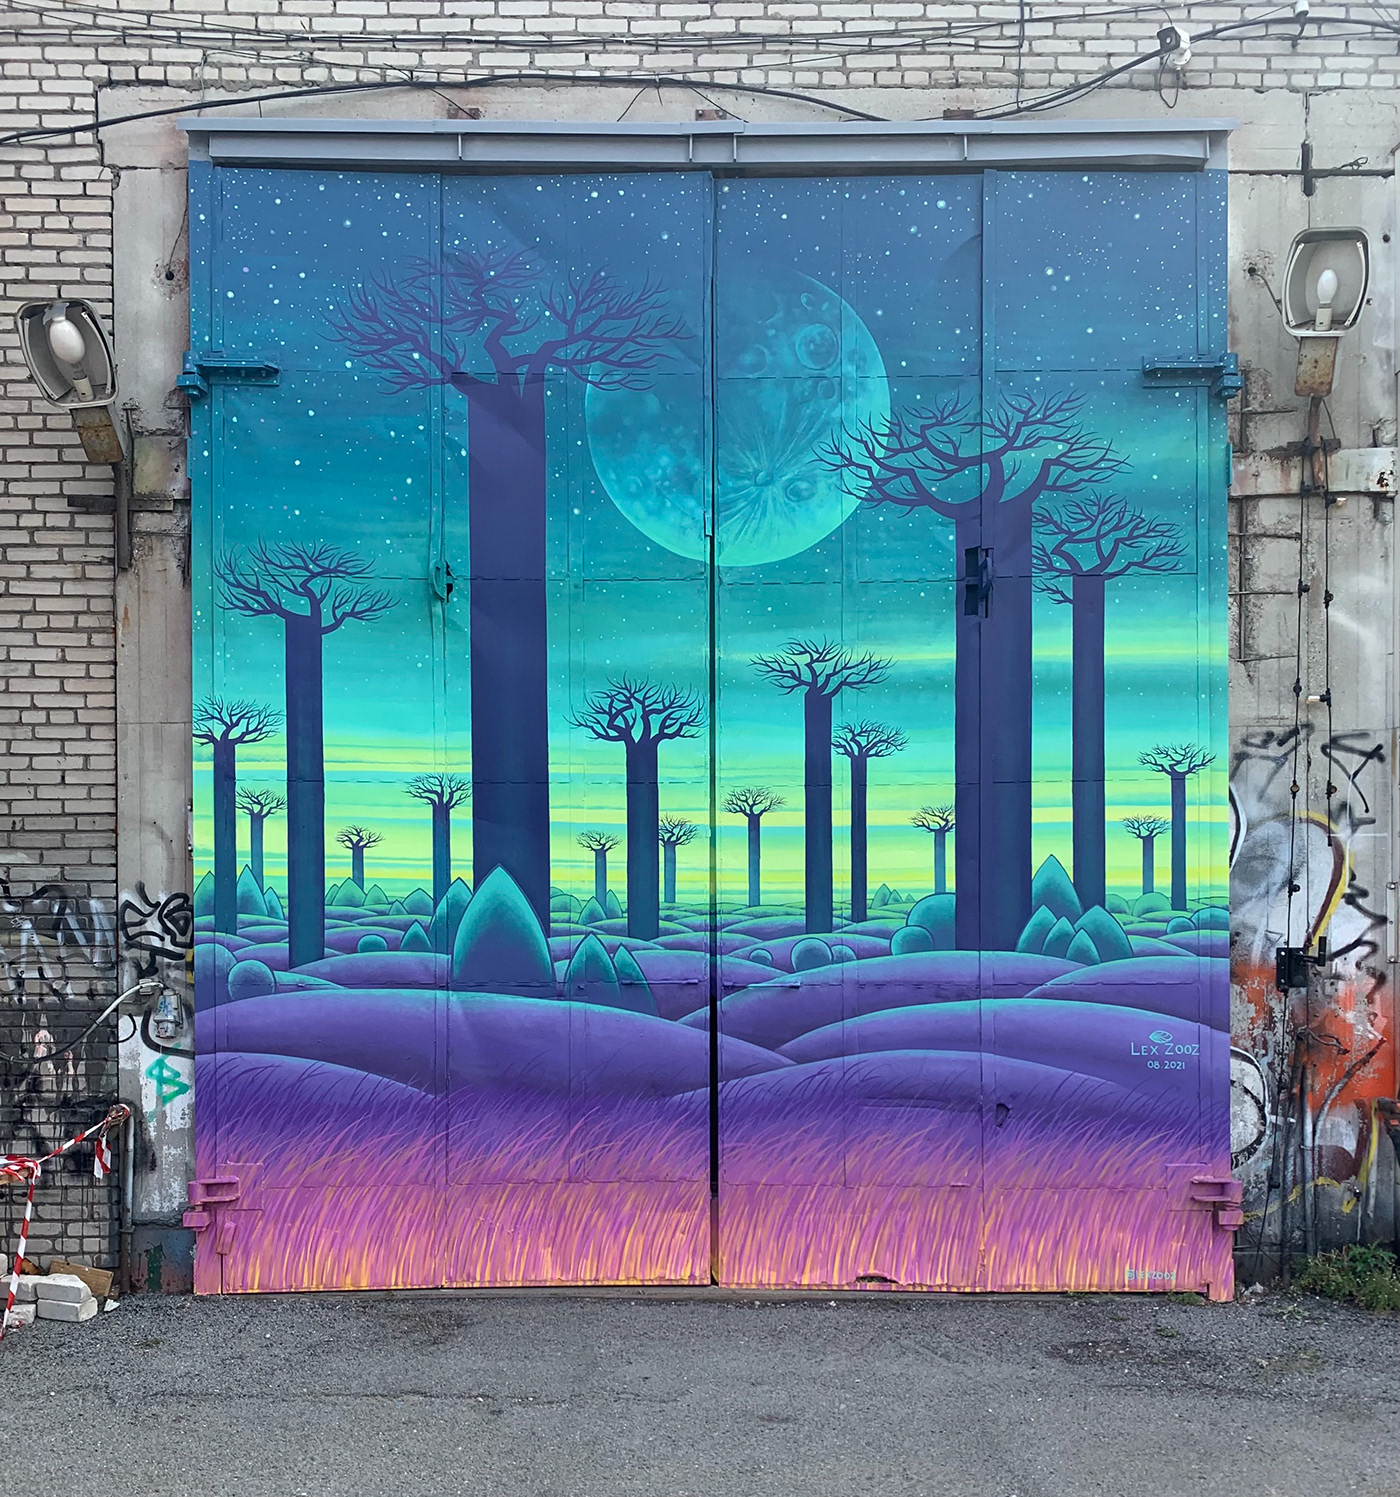 Afrika baobab contemporaryart moon Mural night painting   streetart Urbanart visualart